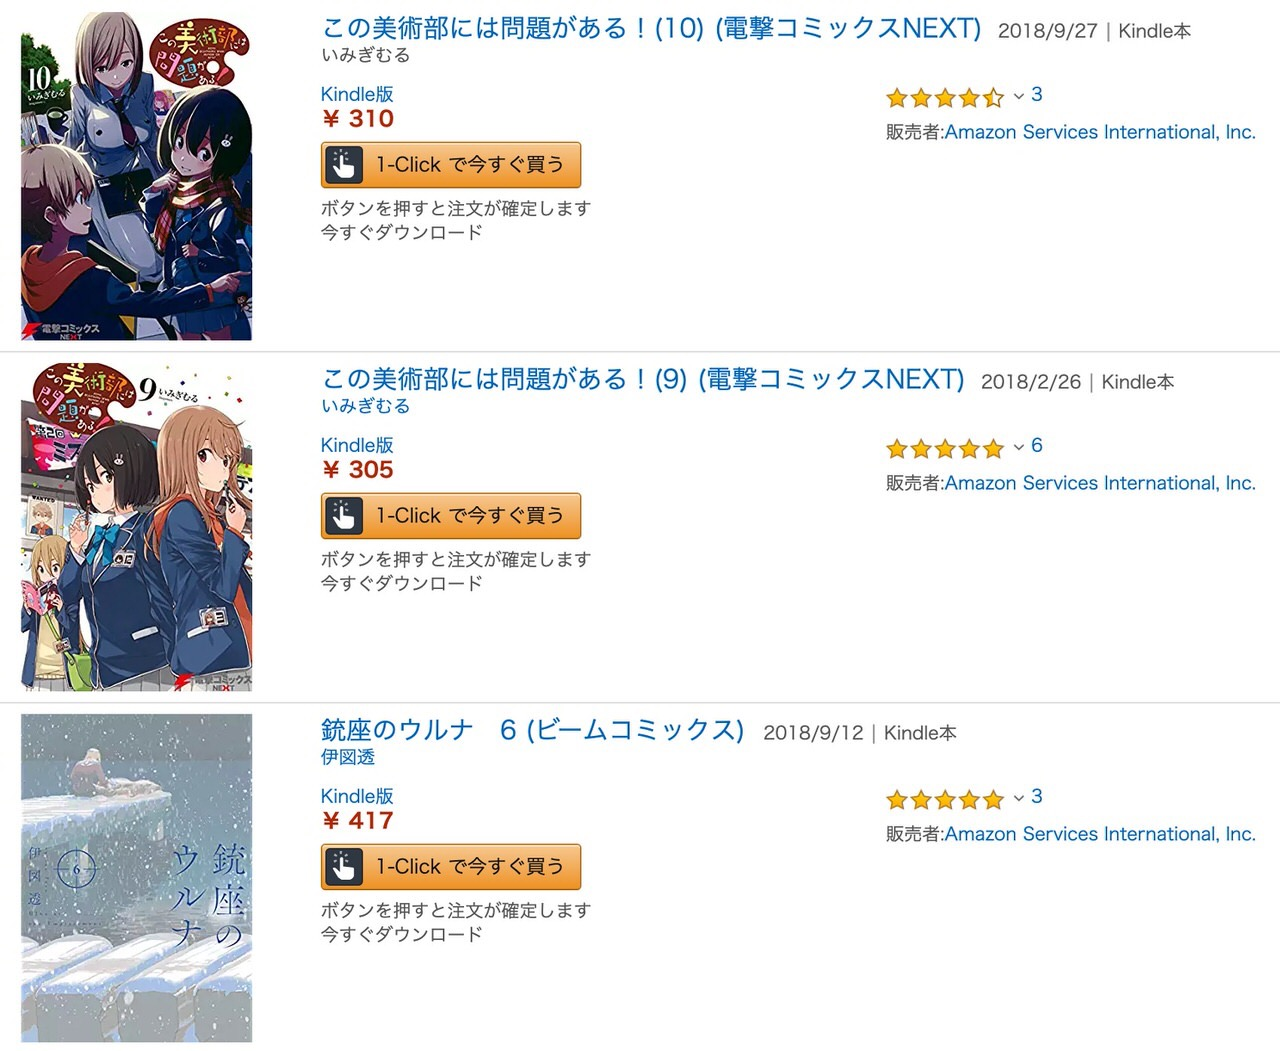 【Kindleセール】5,000冊以上が対象の「KADOKAWA春のコミック・ライトノベル祭り」(5/23まで)